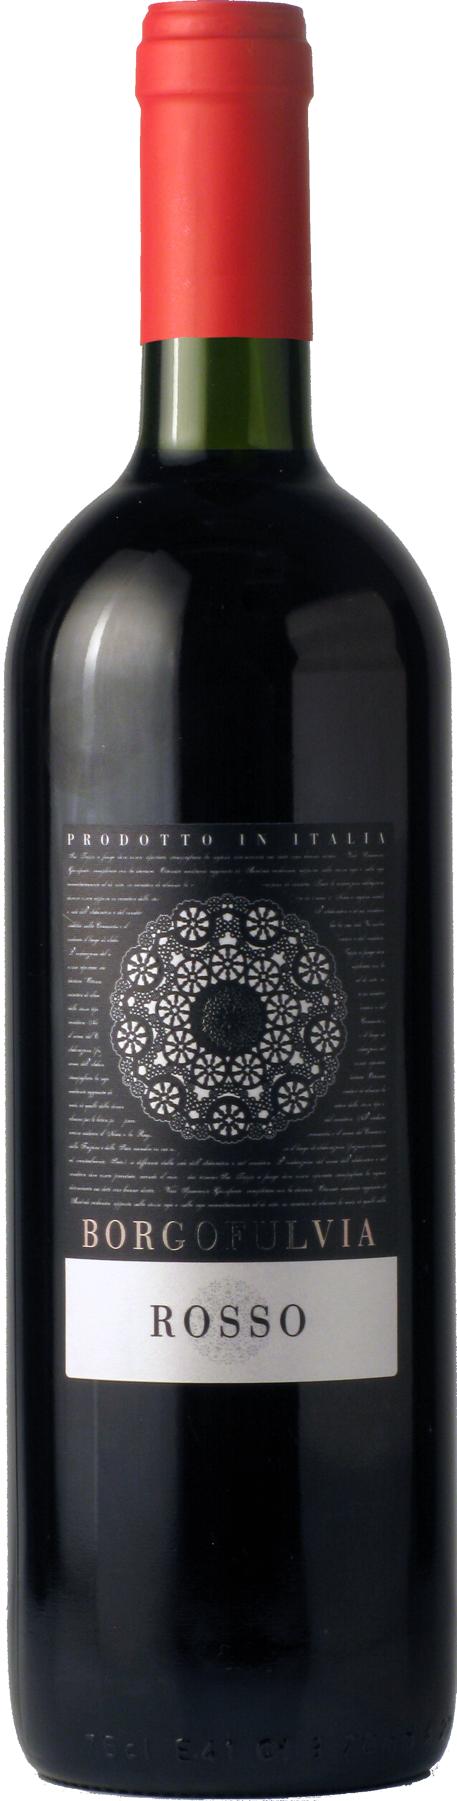 Borgofulvia Rosso, 2018, Montale, Itali�, Rode wijn